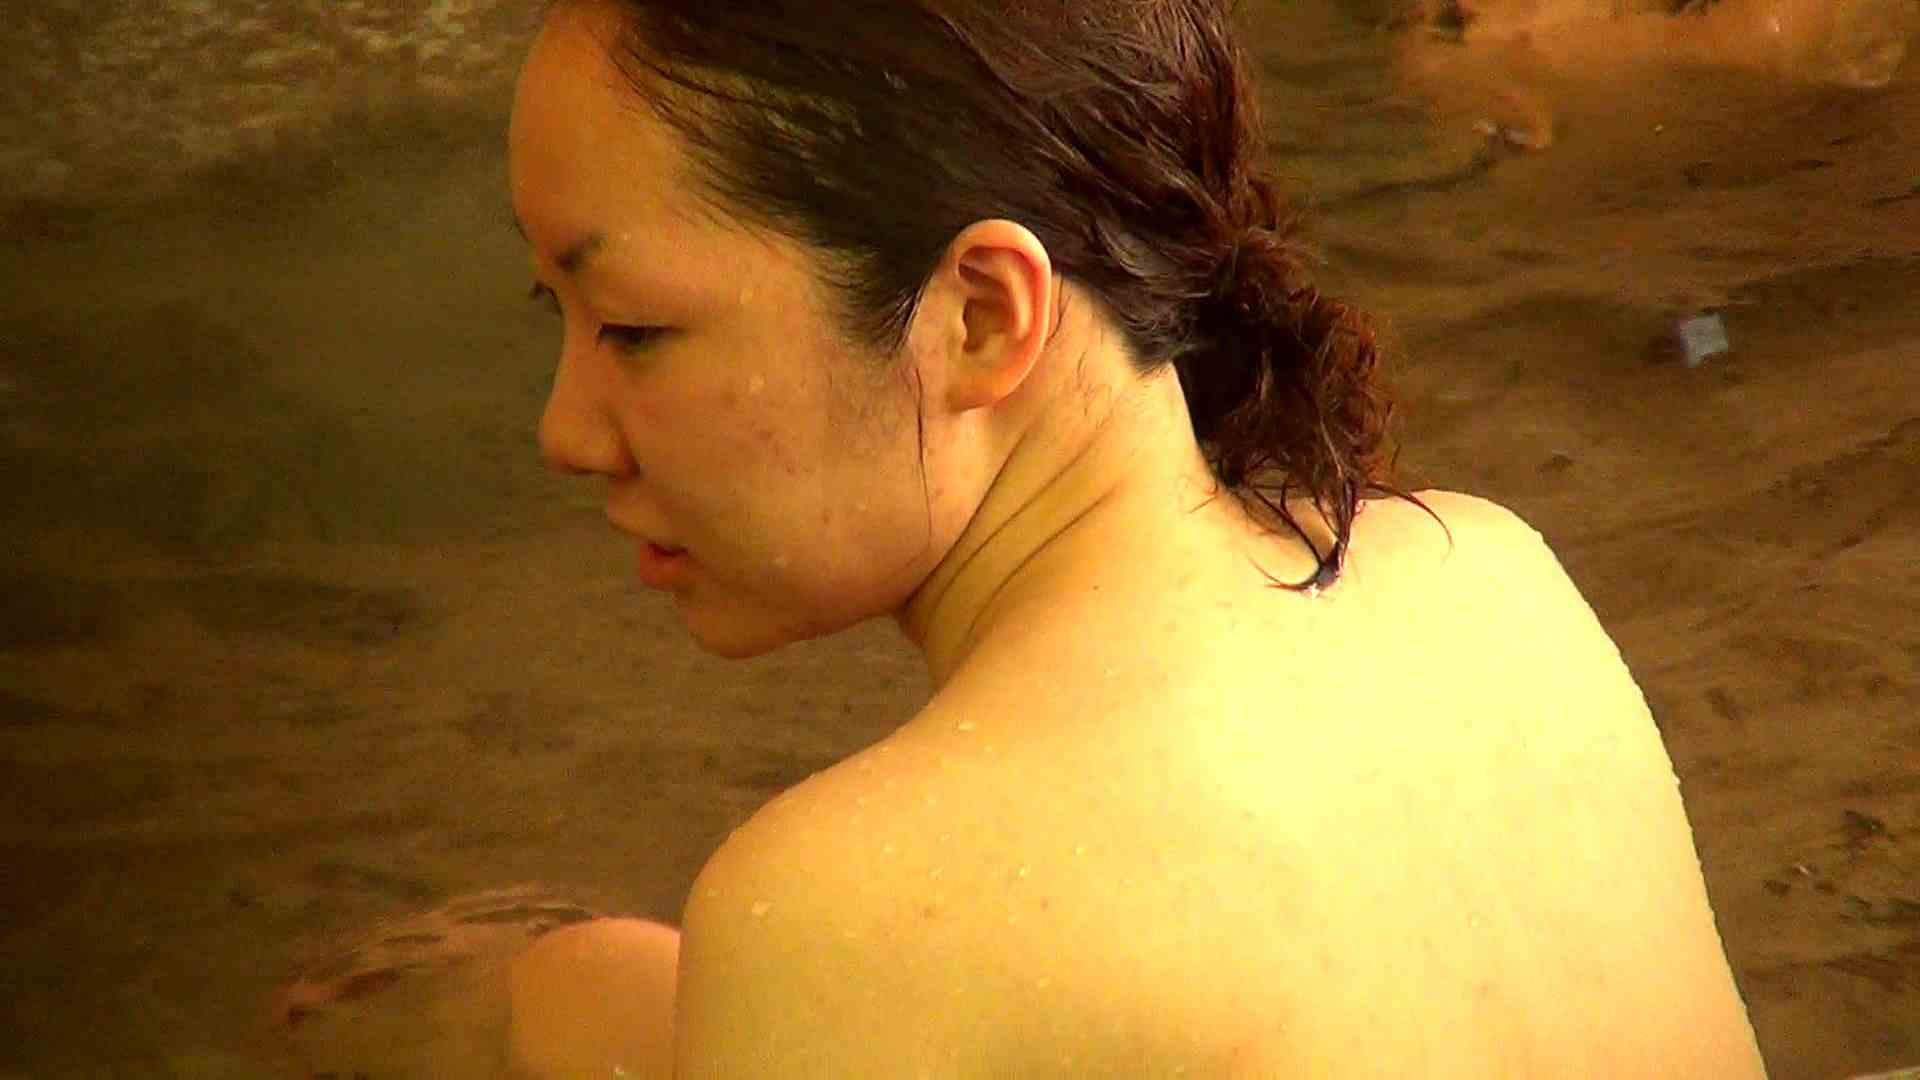 Aquaな露天風呂Vol.268 露天 隠し撮りオマンコ動画紹介 107画像 89